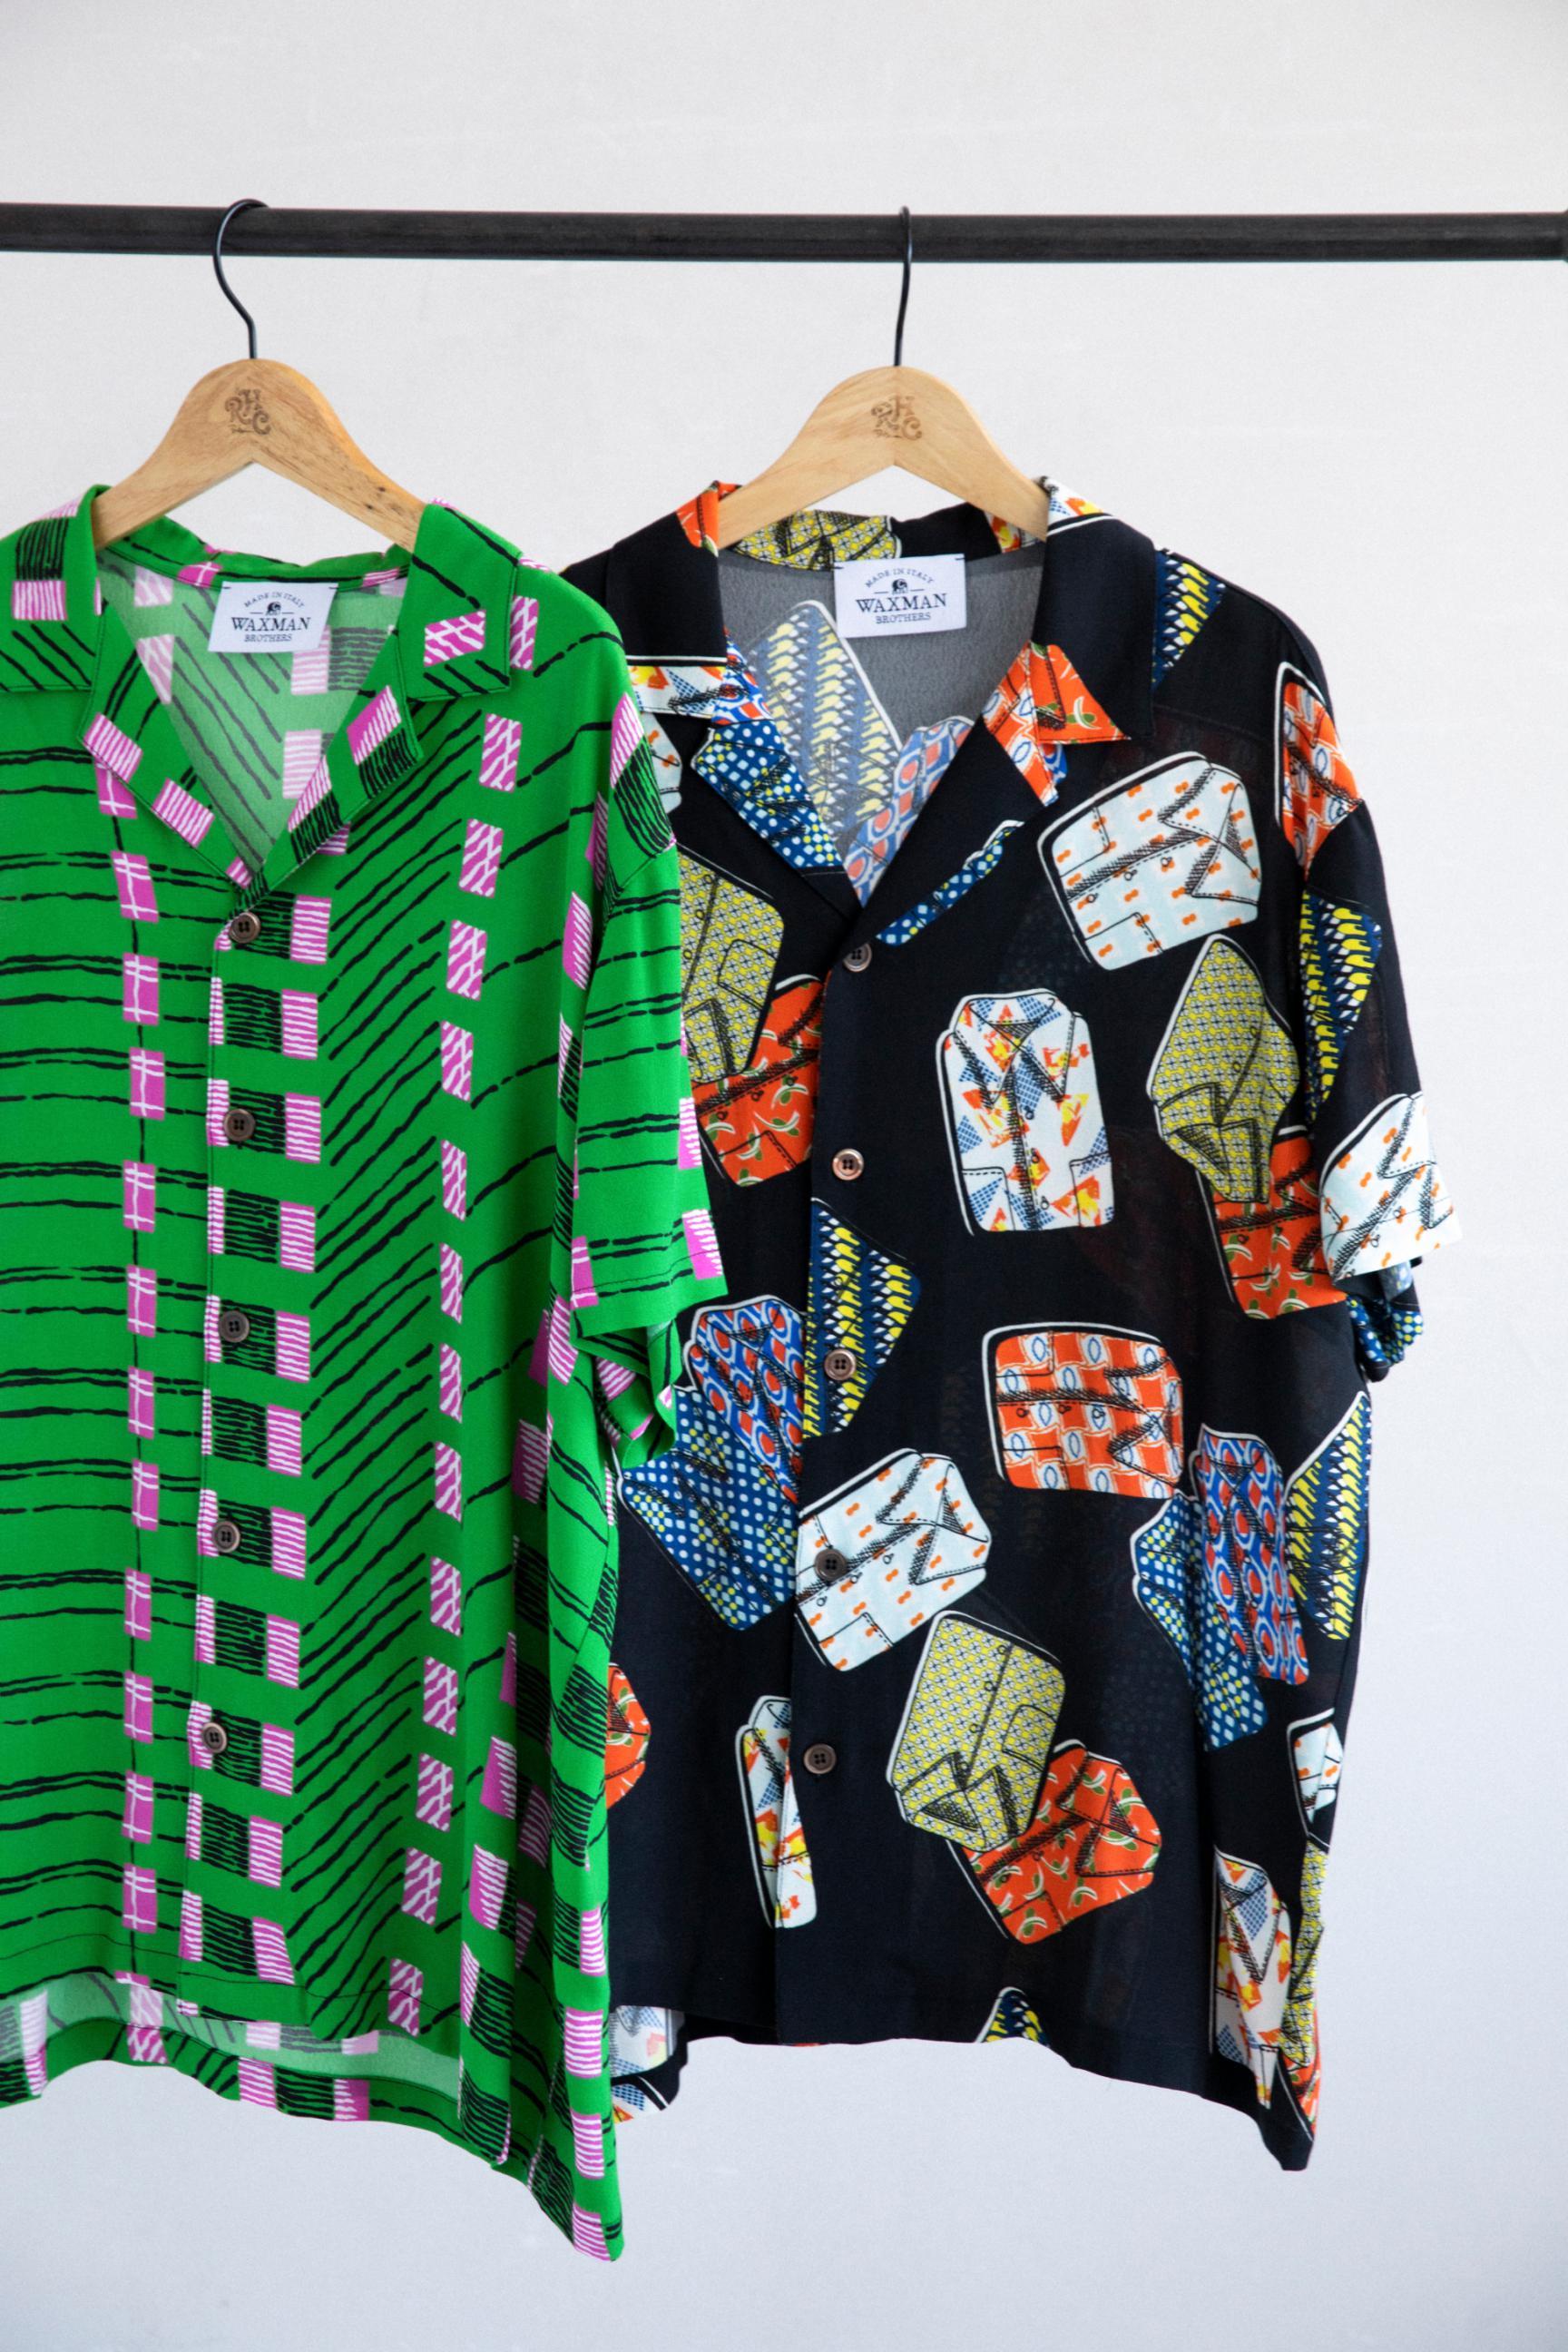 25 shirt¥23,100 shirt¥23,100